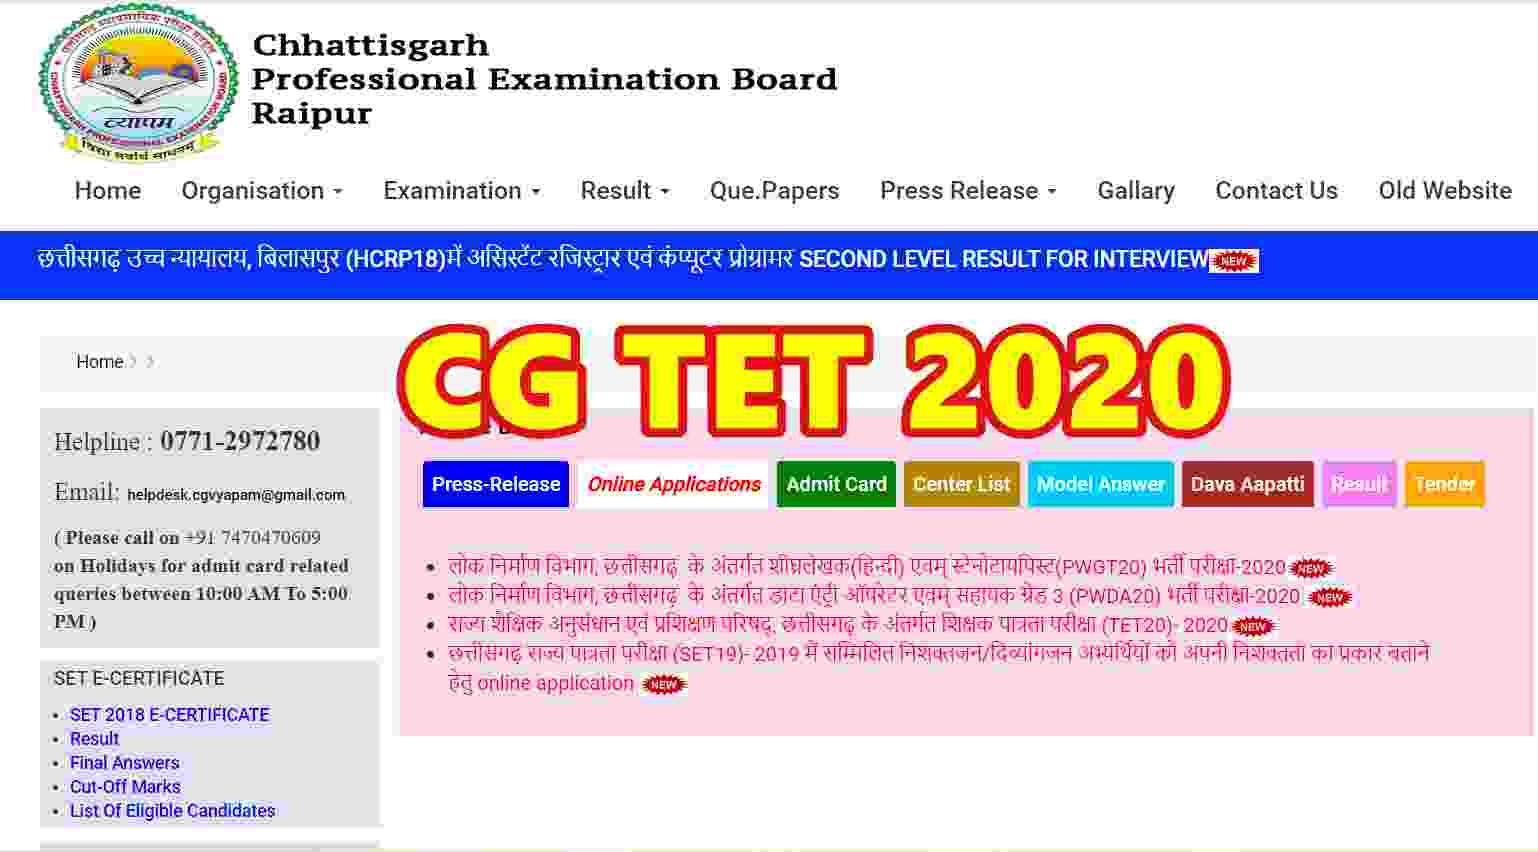 CG TET 2020: Online Form, Exam Date, Syllabus, Eligibility Criteria